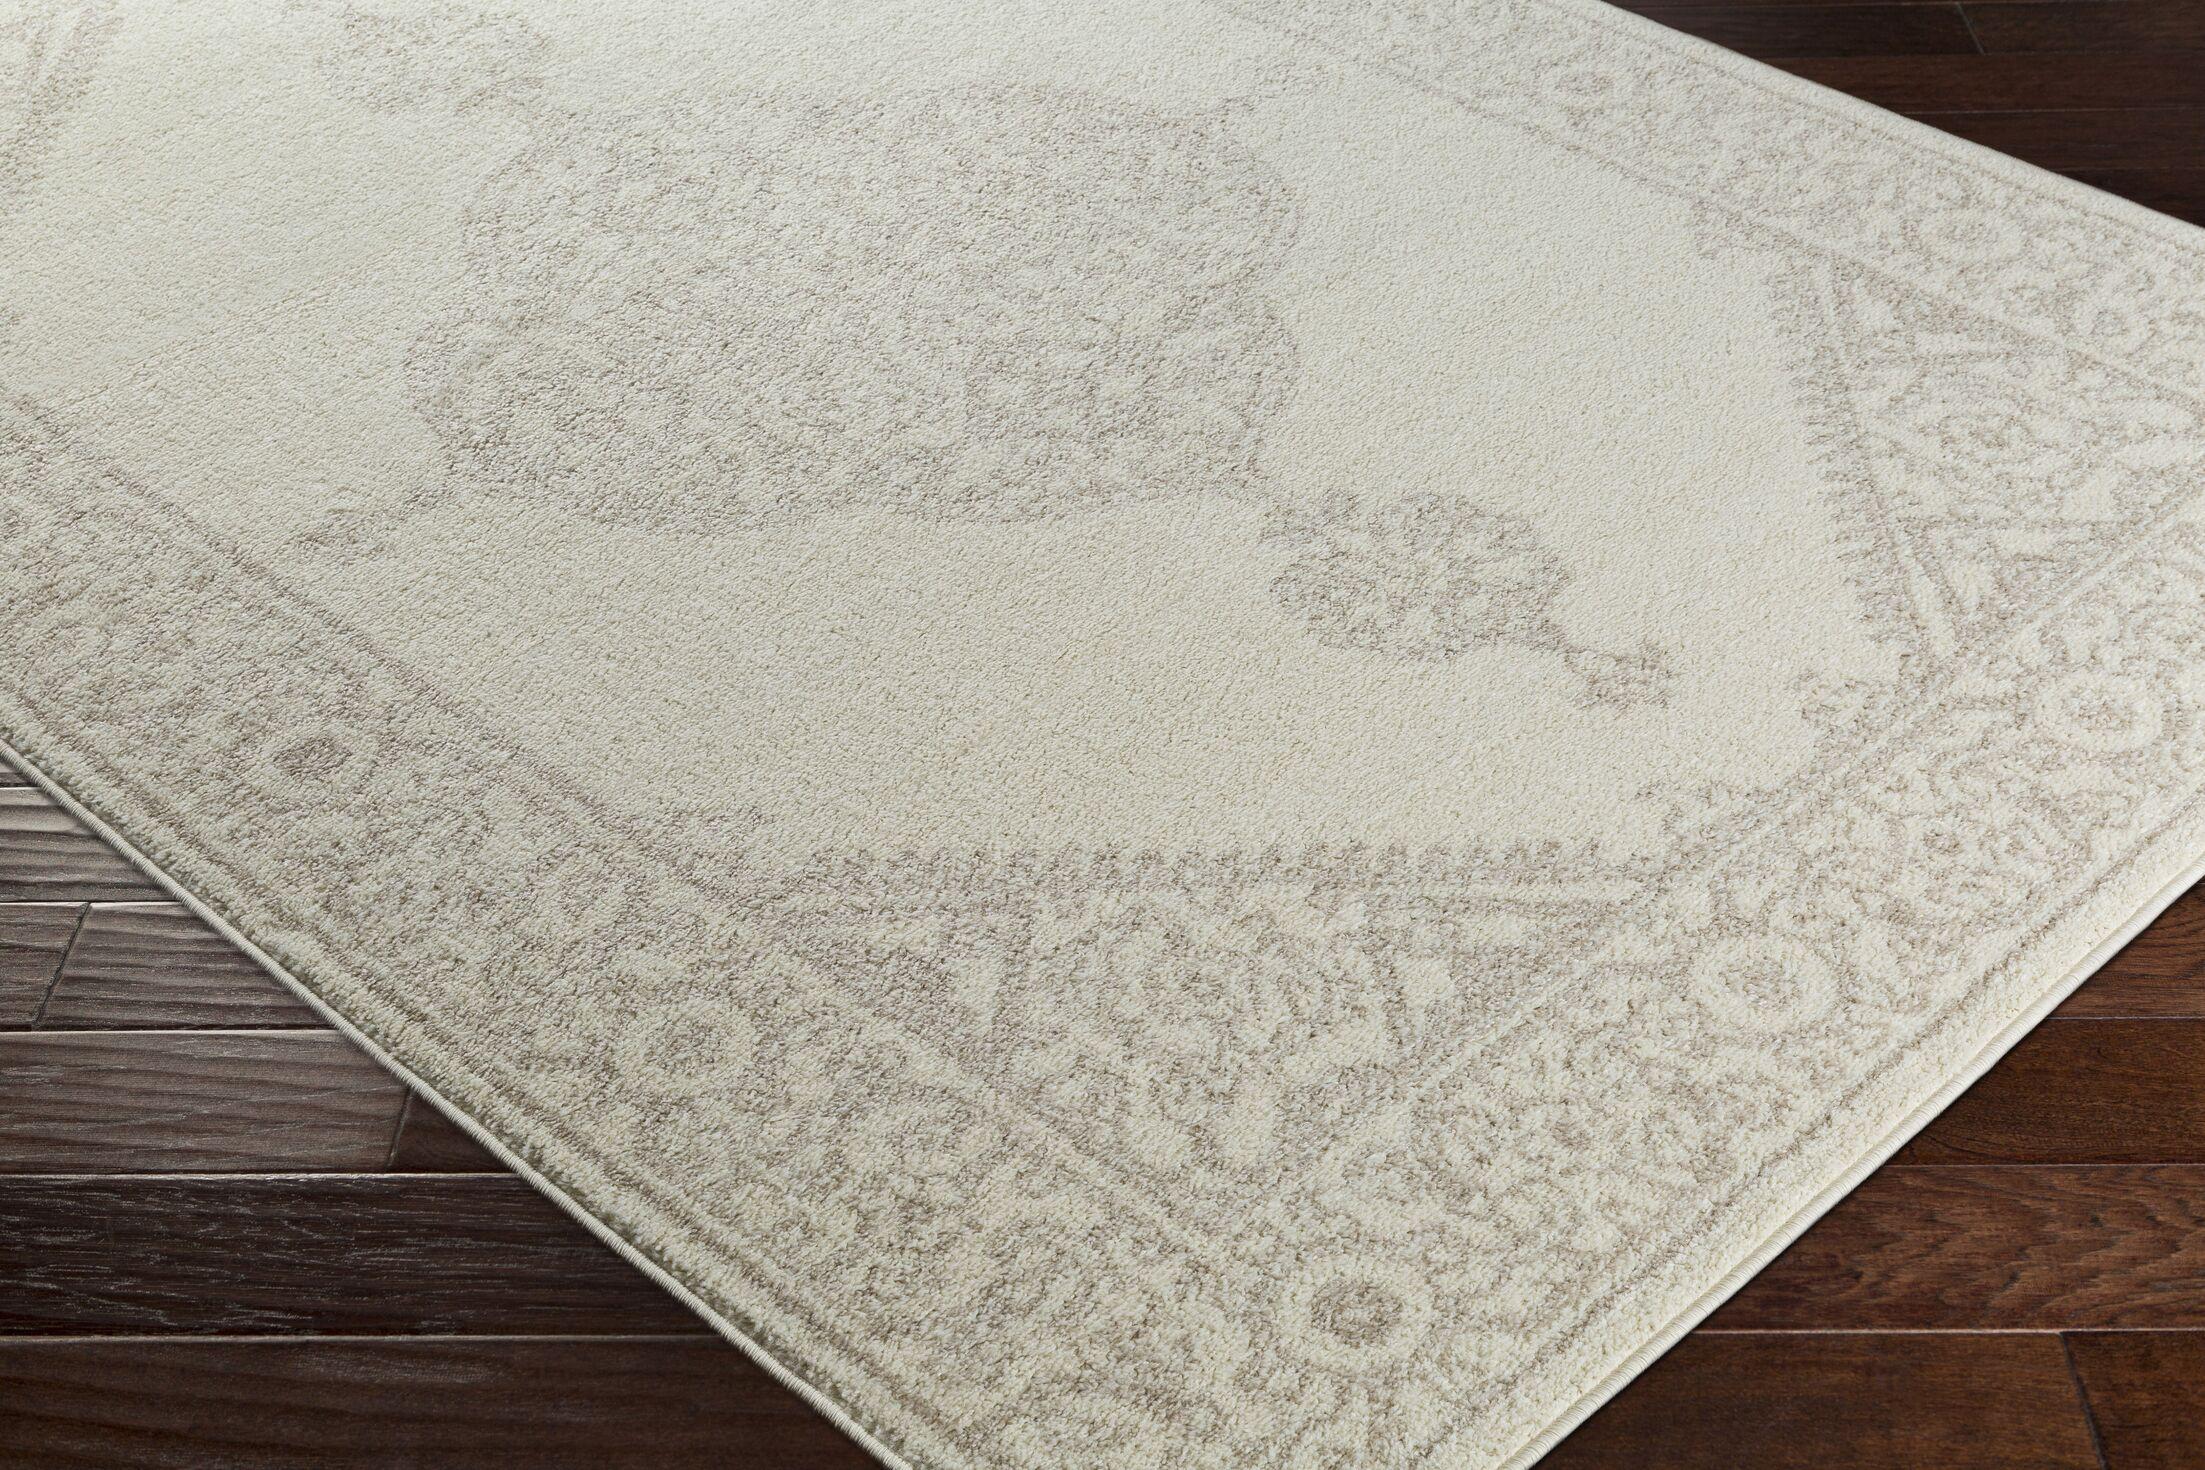 Corinna Beige/Gray Area Rug Rug Size: Rectangle 8' x 10'